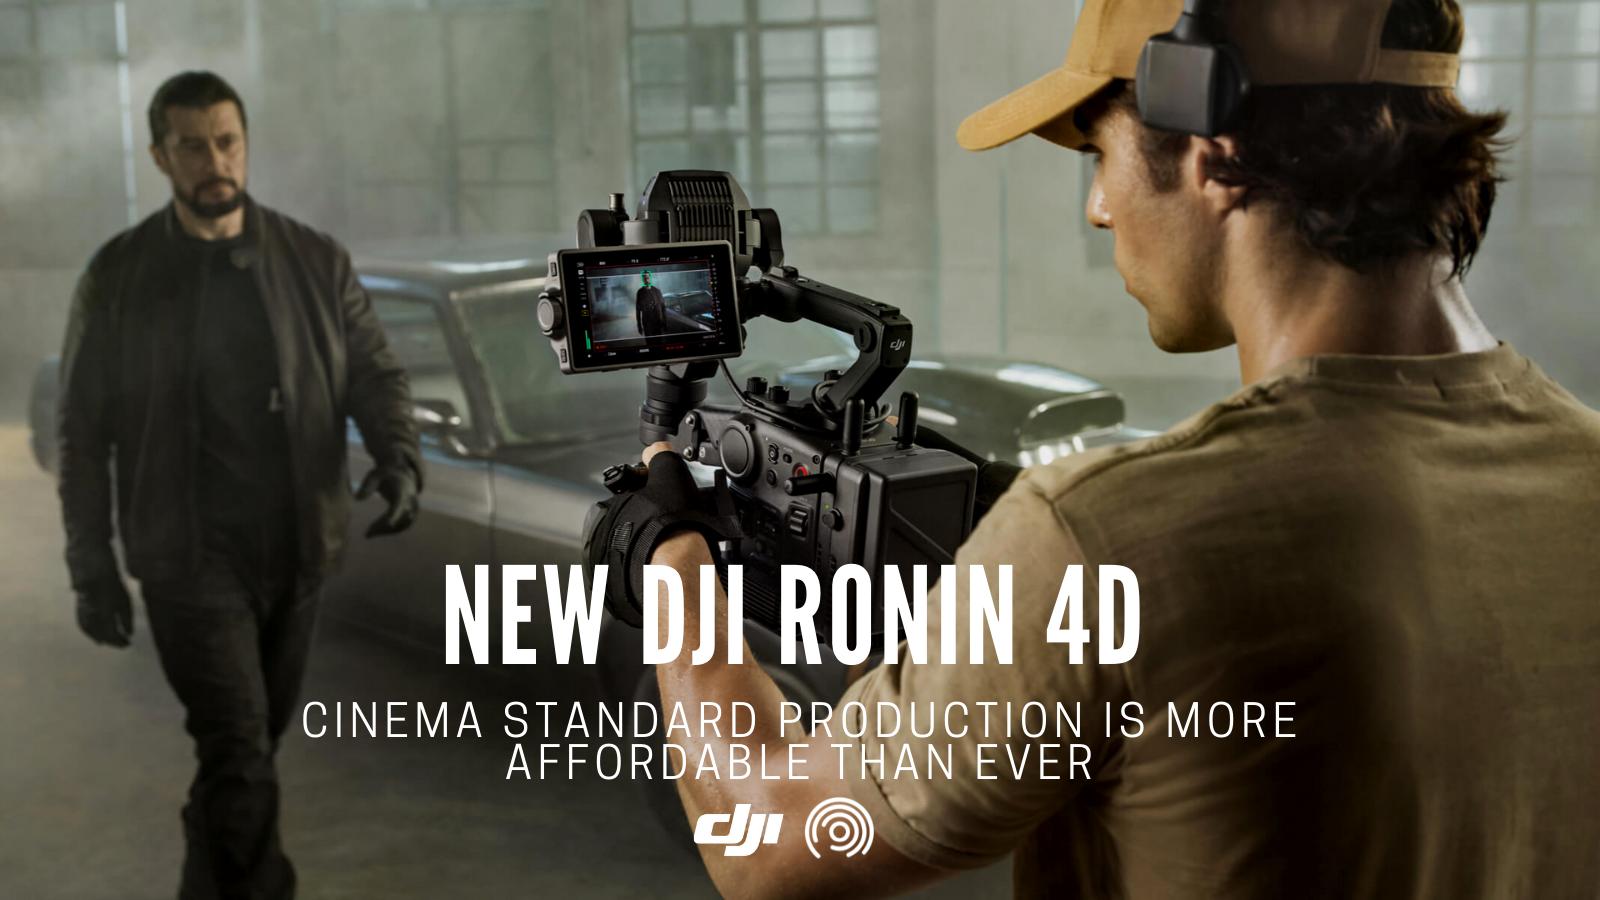 Ambitious New DJI Ronin 4D Cinema Camera Combo